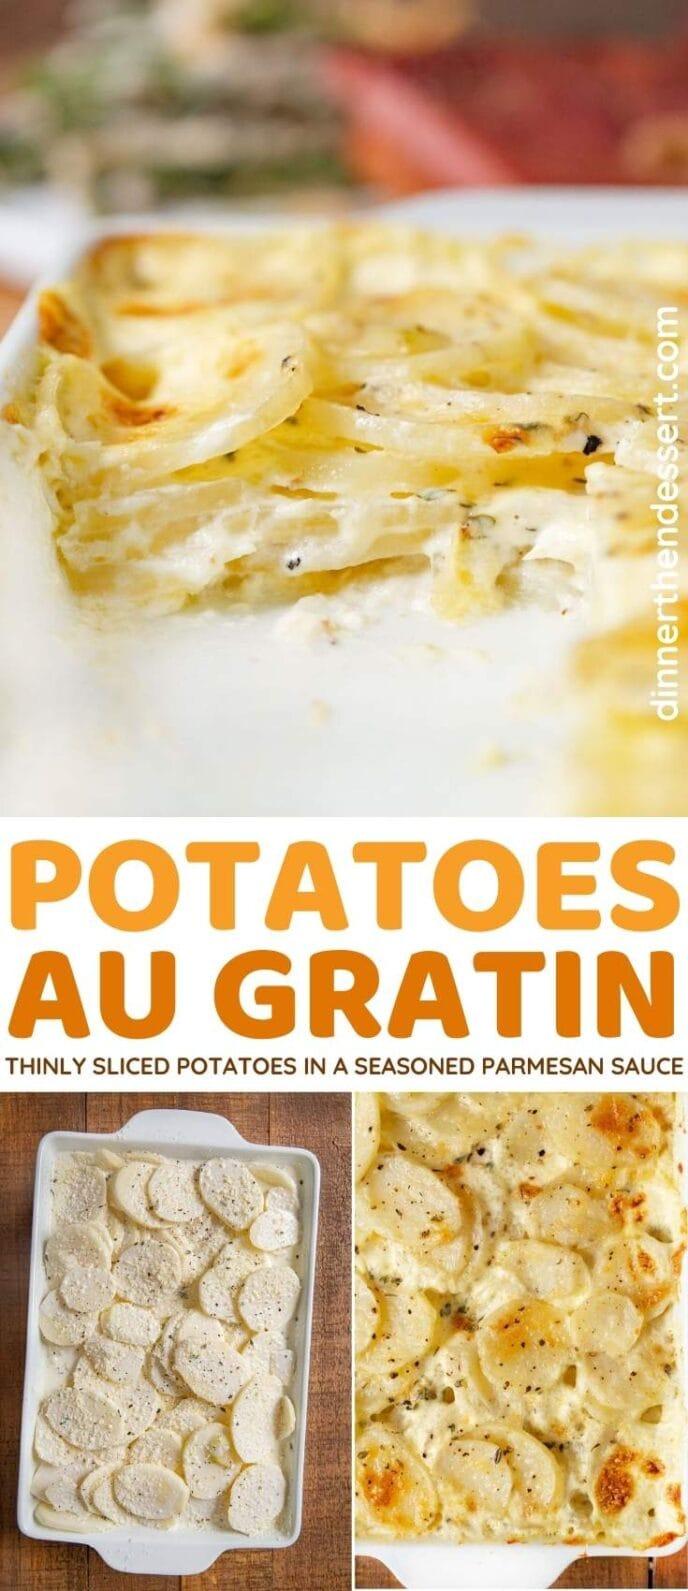 Potatoes Au Gratin collage